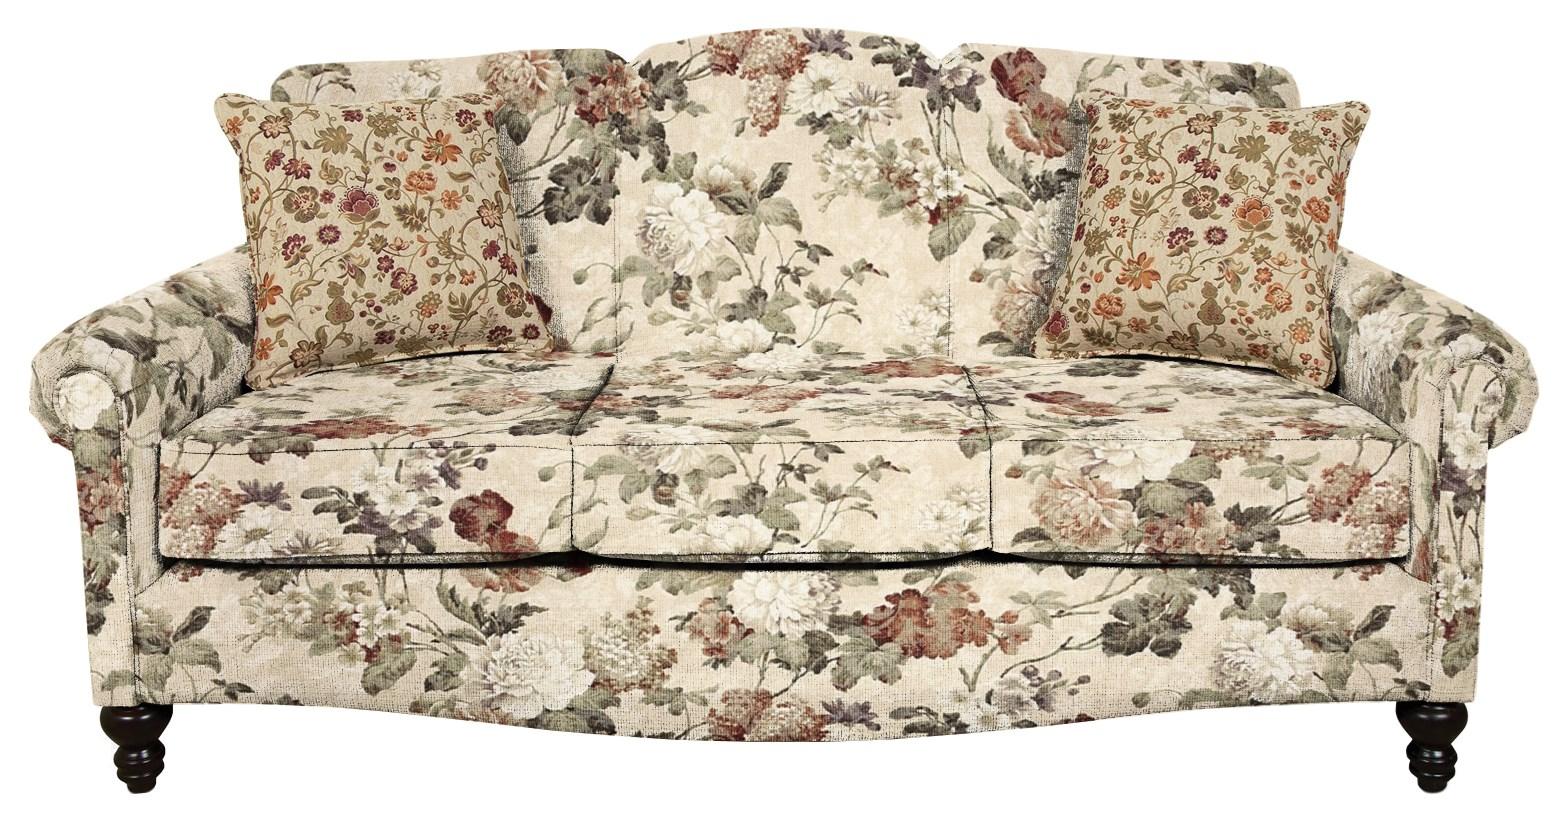 England Eliza Traditionanl Upholstered Sofa   Virginia Furniture Market    Sofa